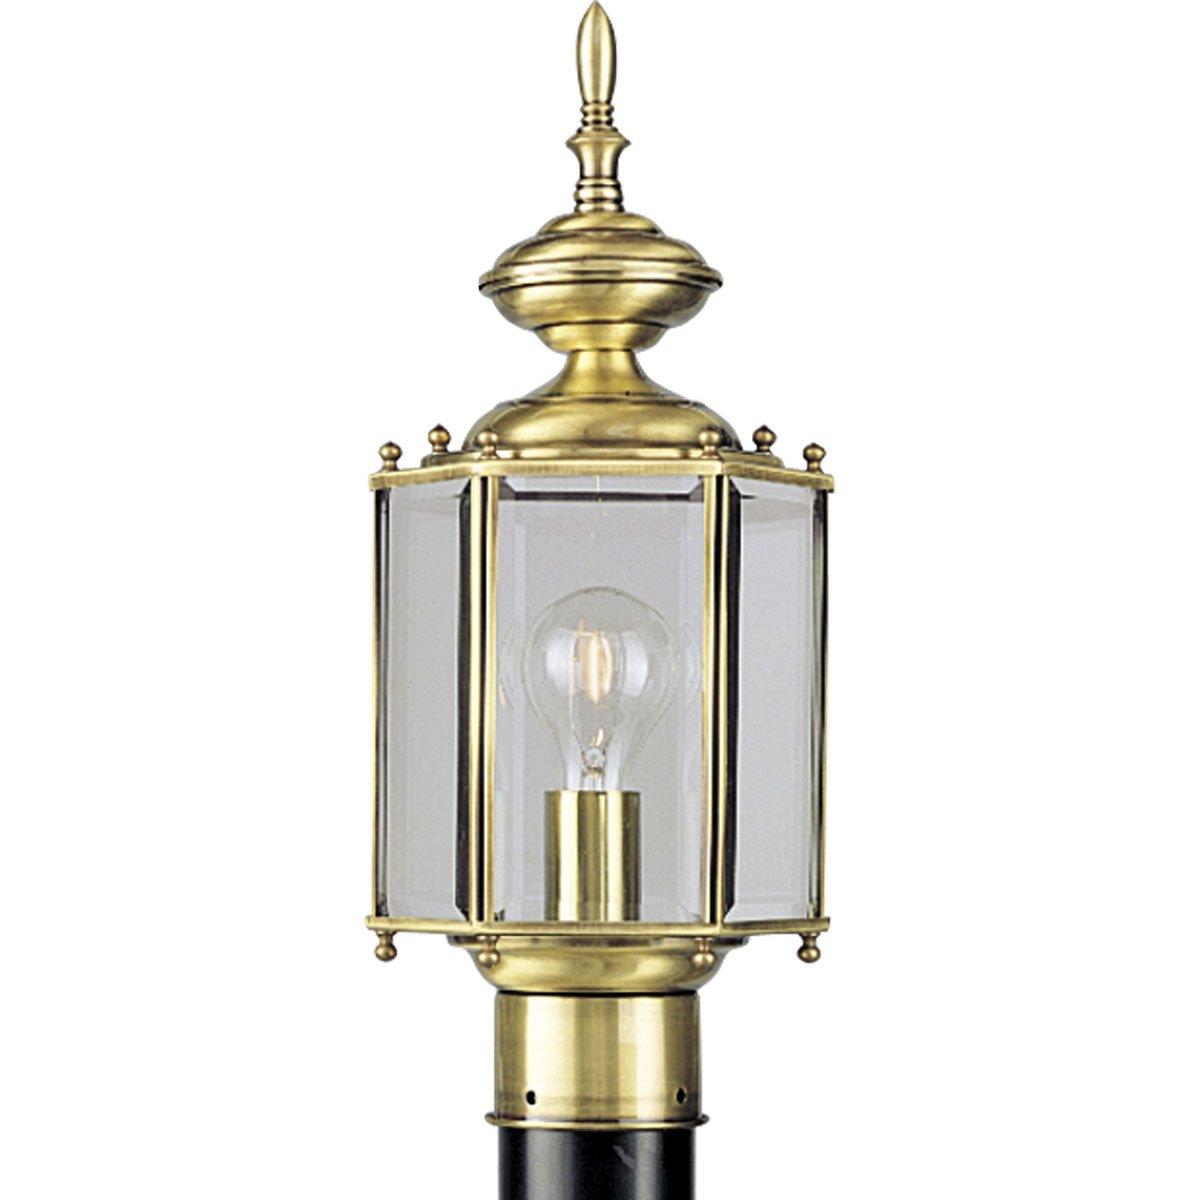 Progress Lighting P5430-10 Hexagonal Post Lantern with Beveled Glass, Polished Brass